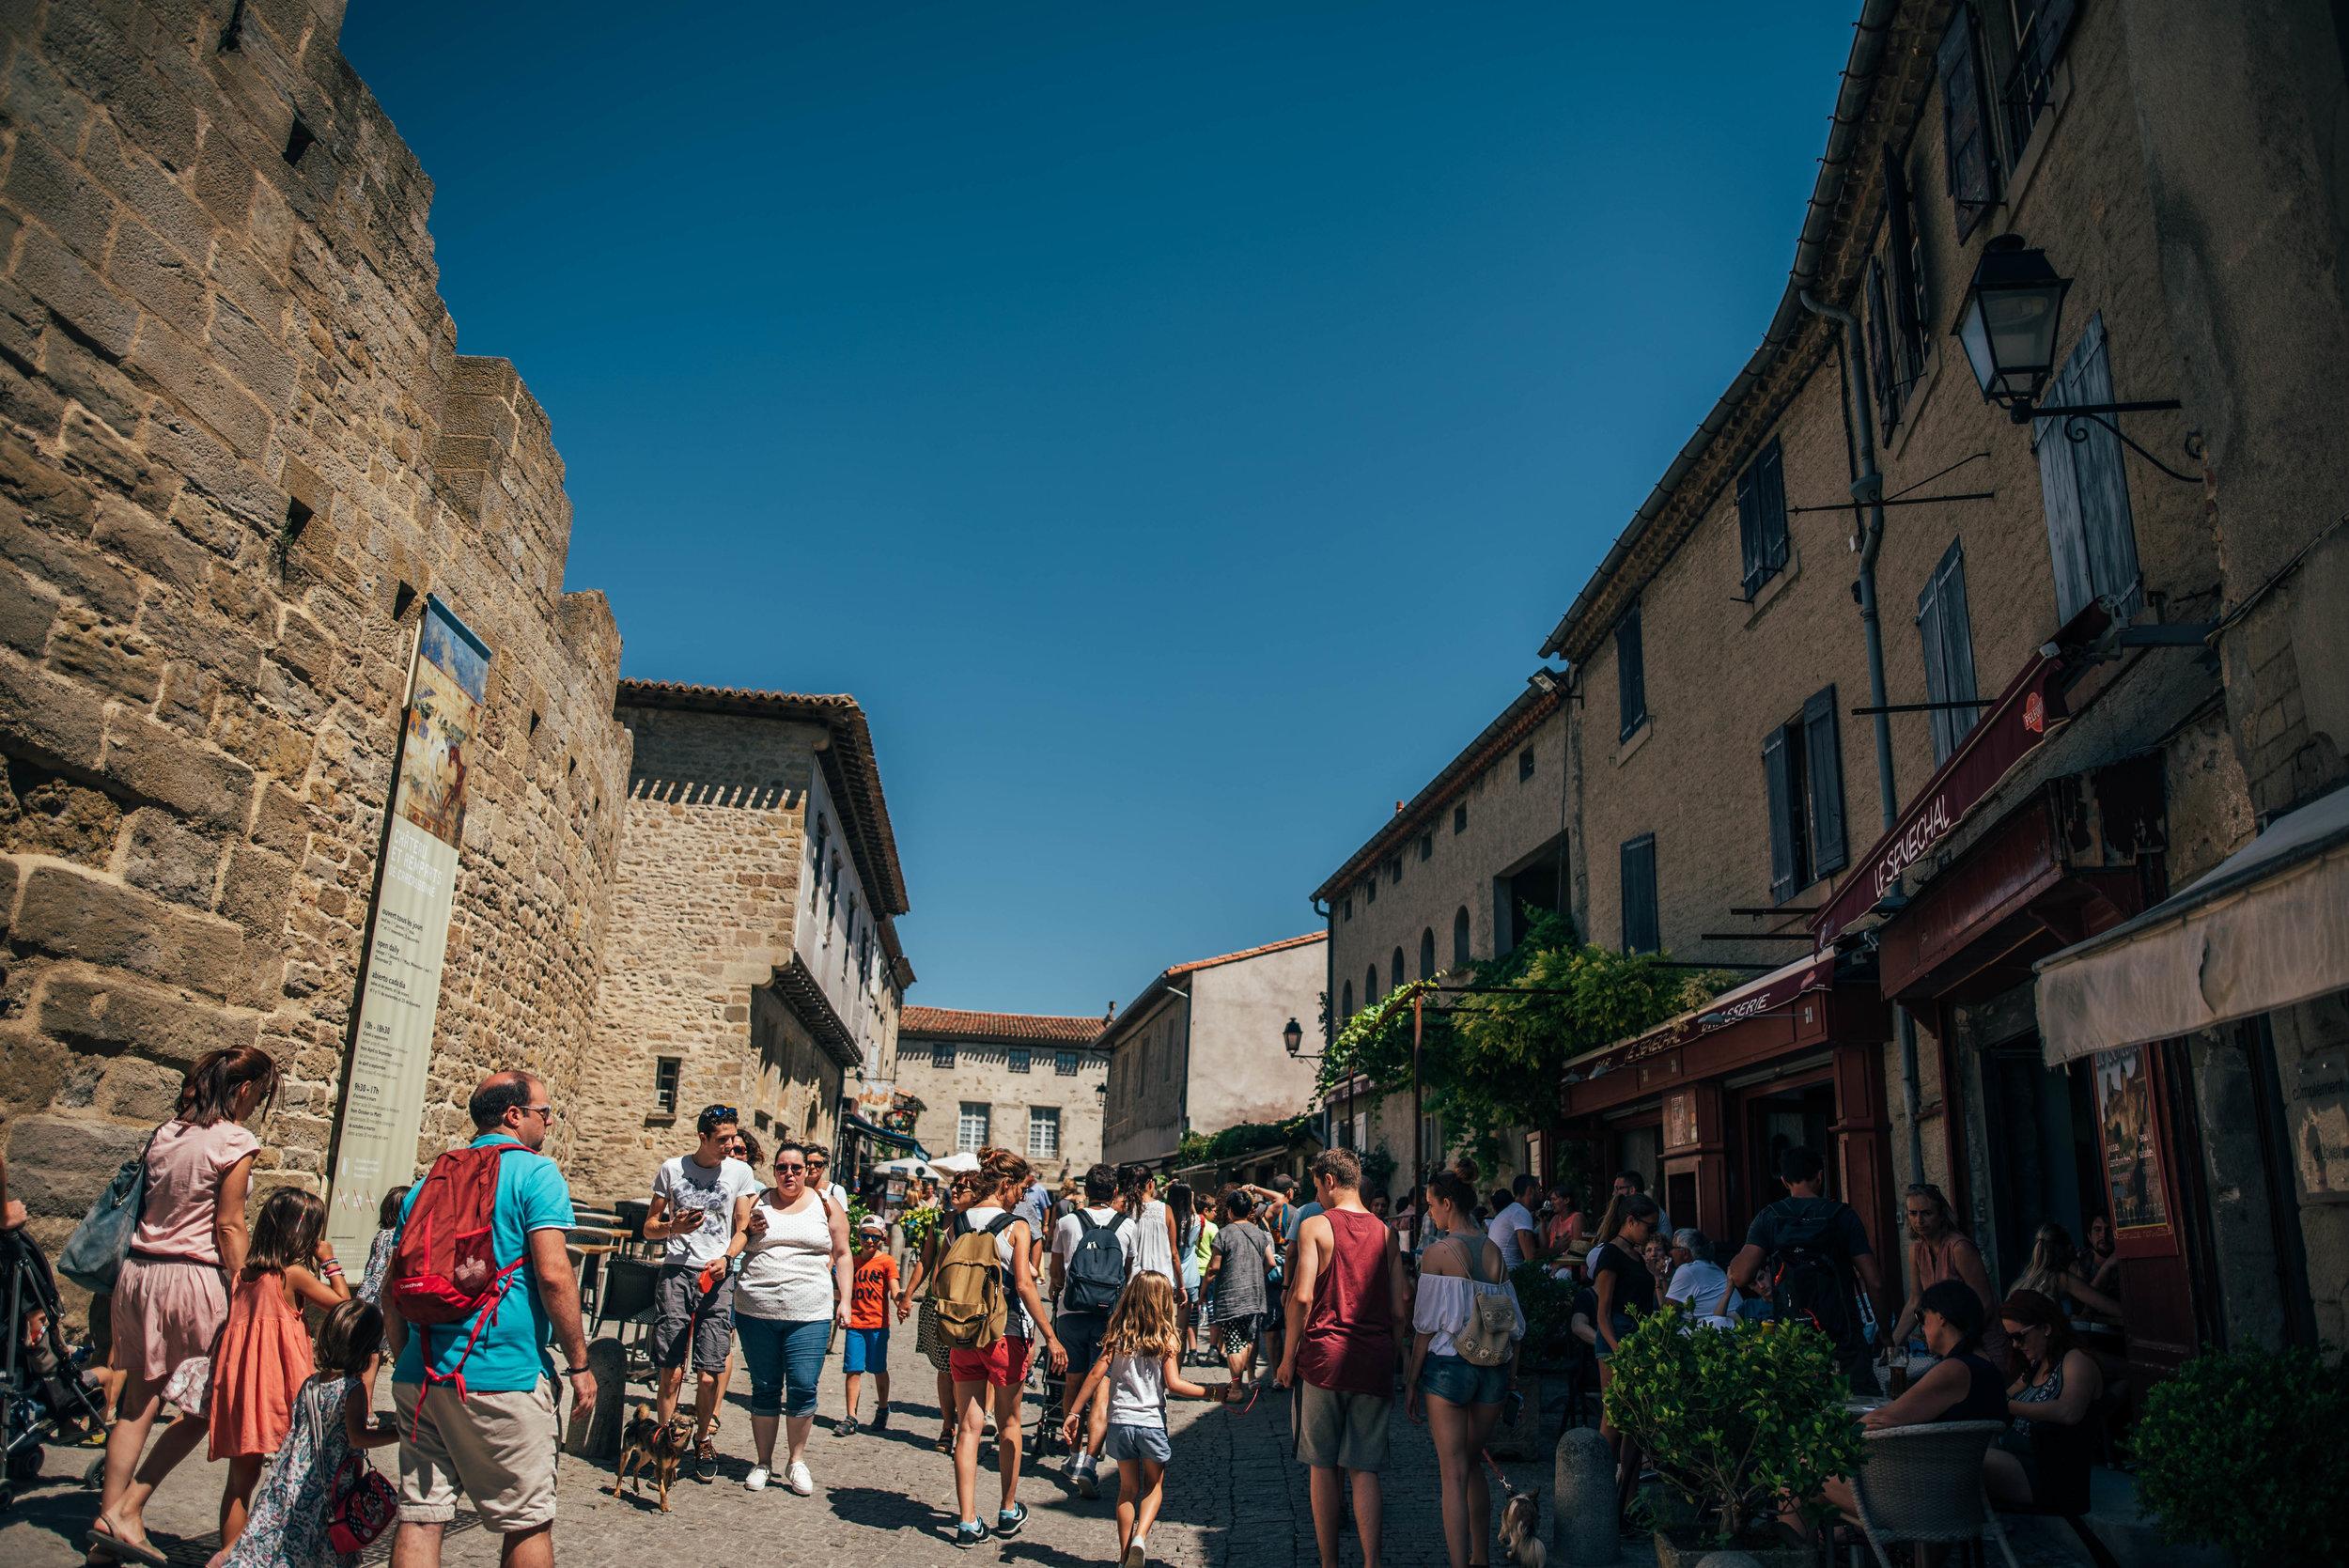 Carcassonne Citadel France UK Documentary Photographer